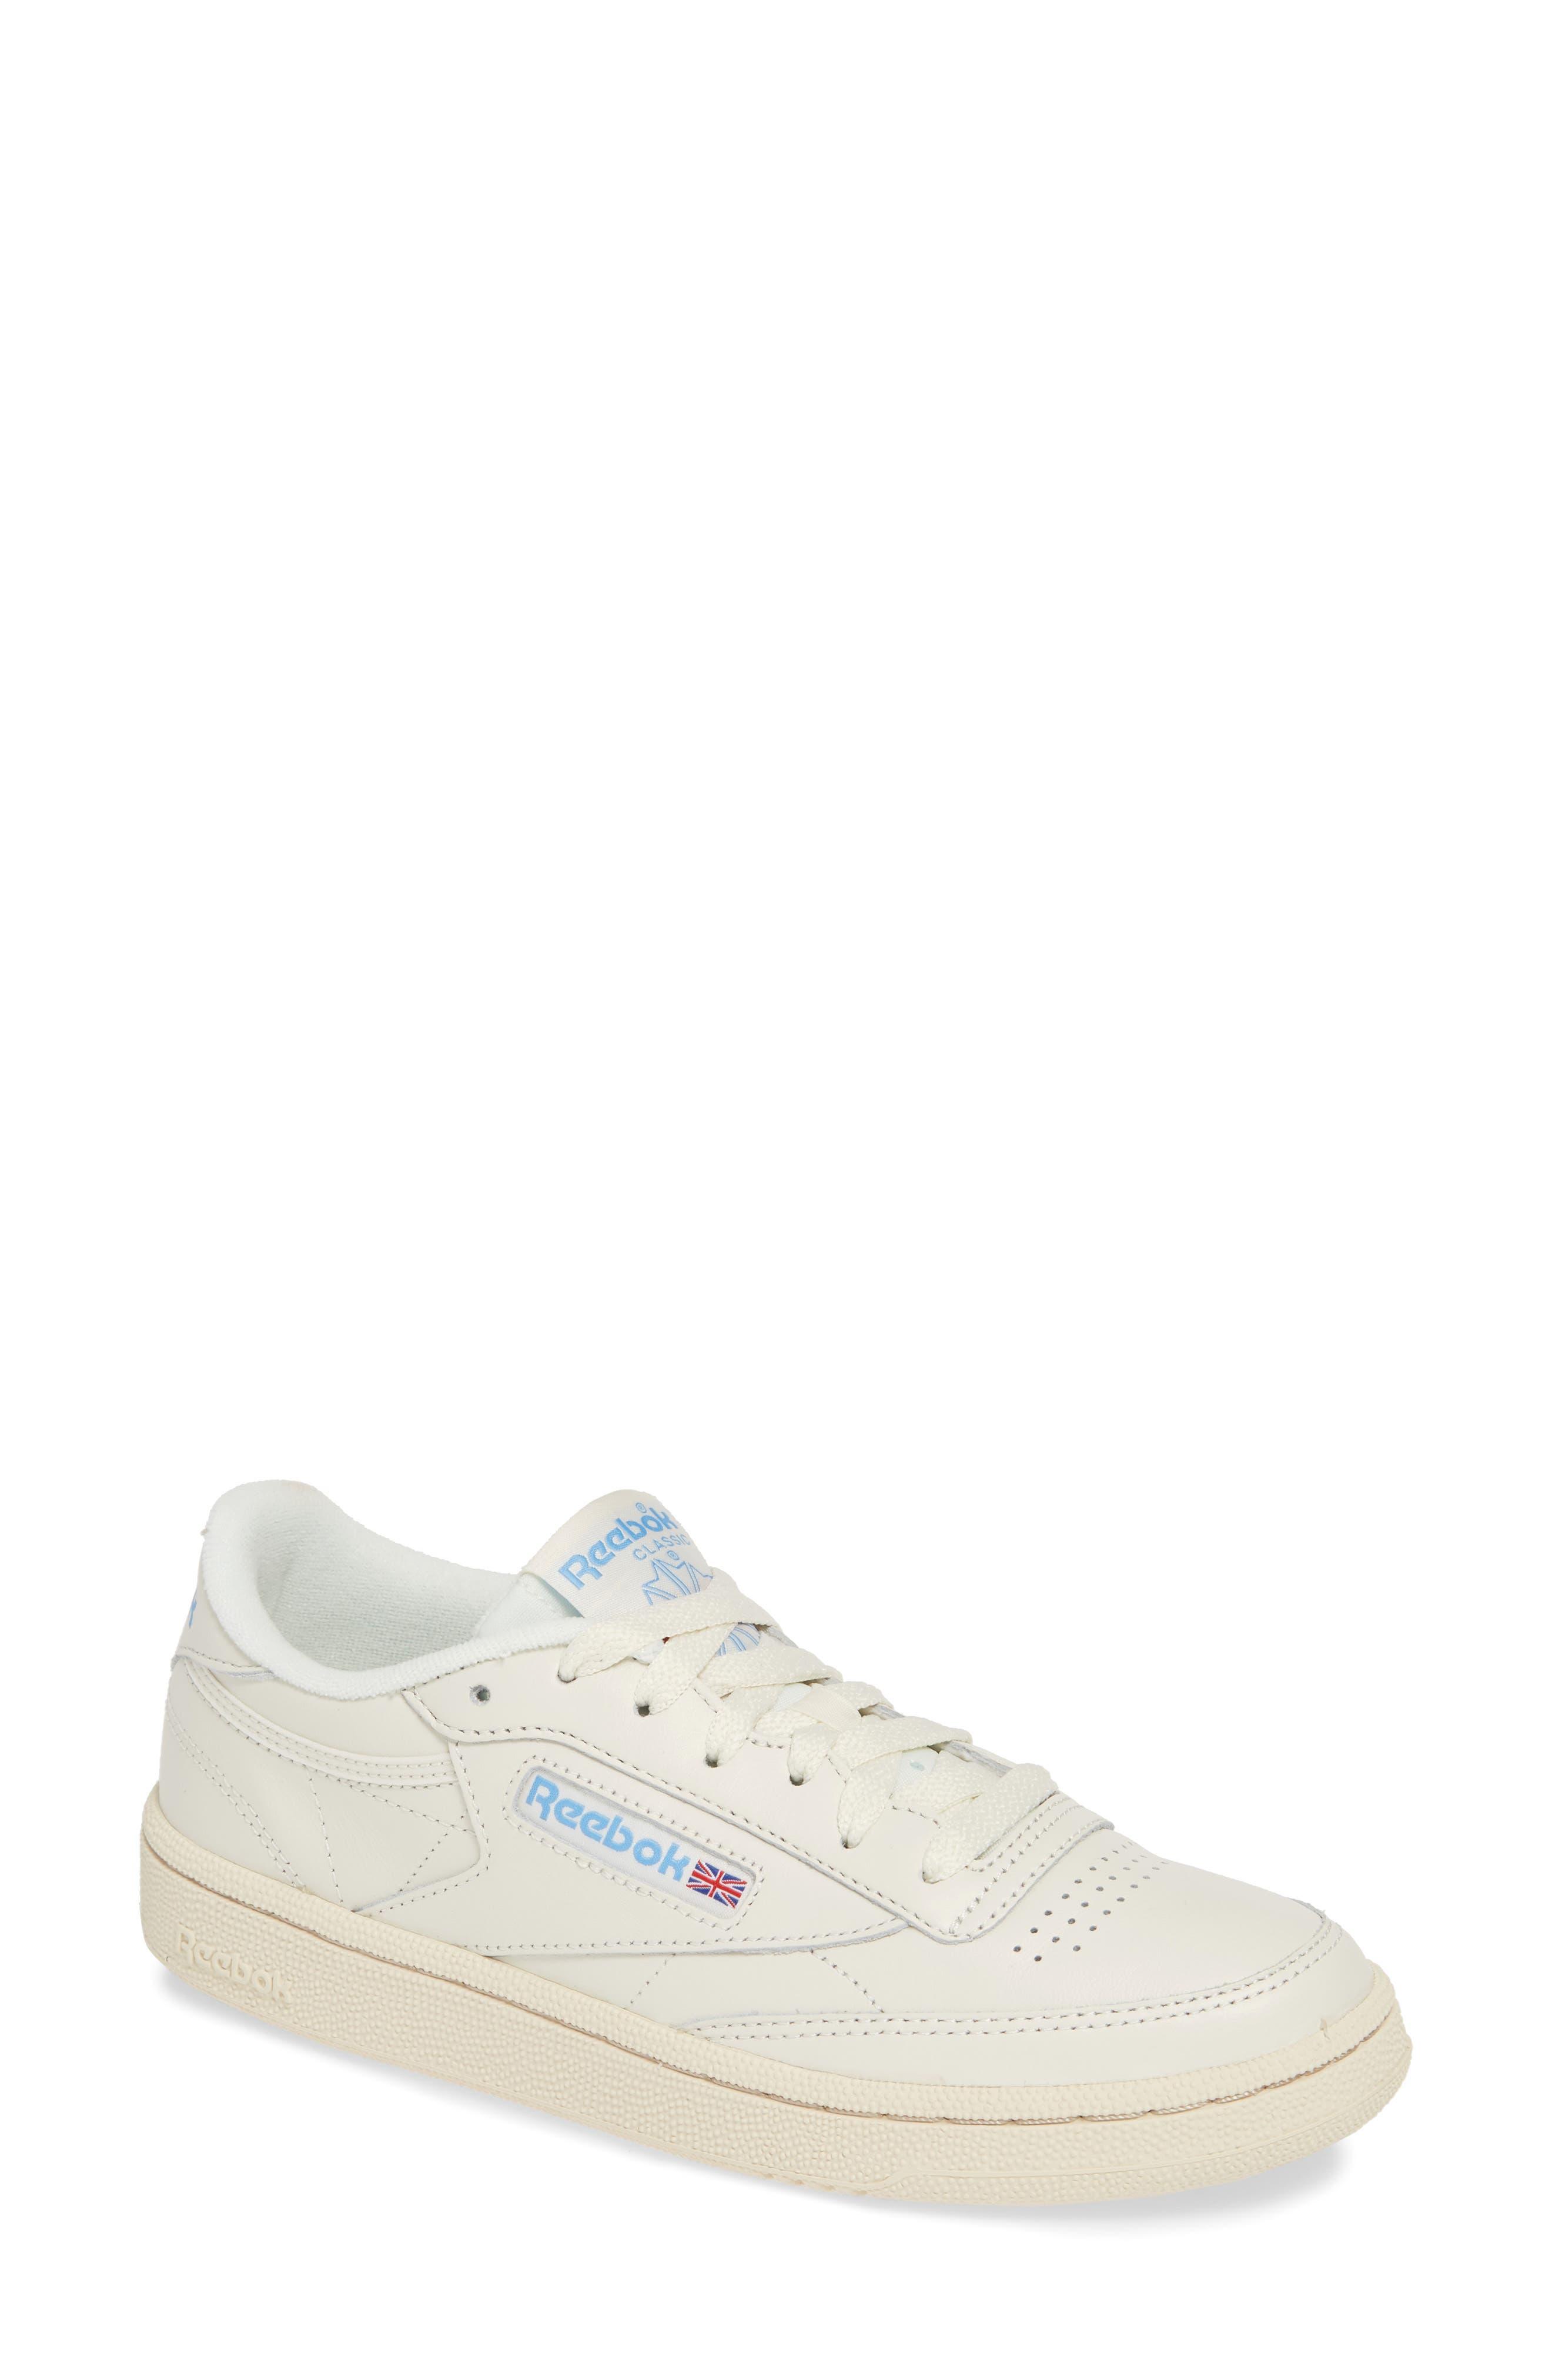 Reebok Women's Reebok Classic Leather Sneaker, Size 10 M White from NORDSTROM | ShapeShop